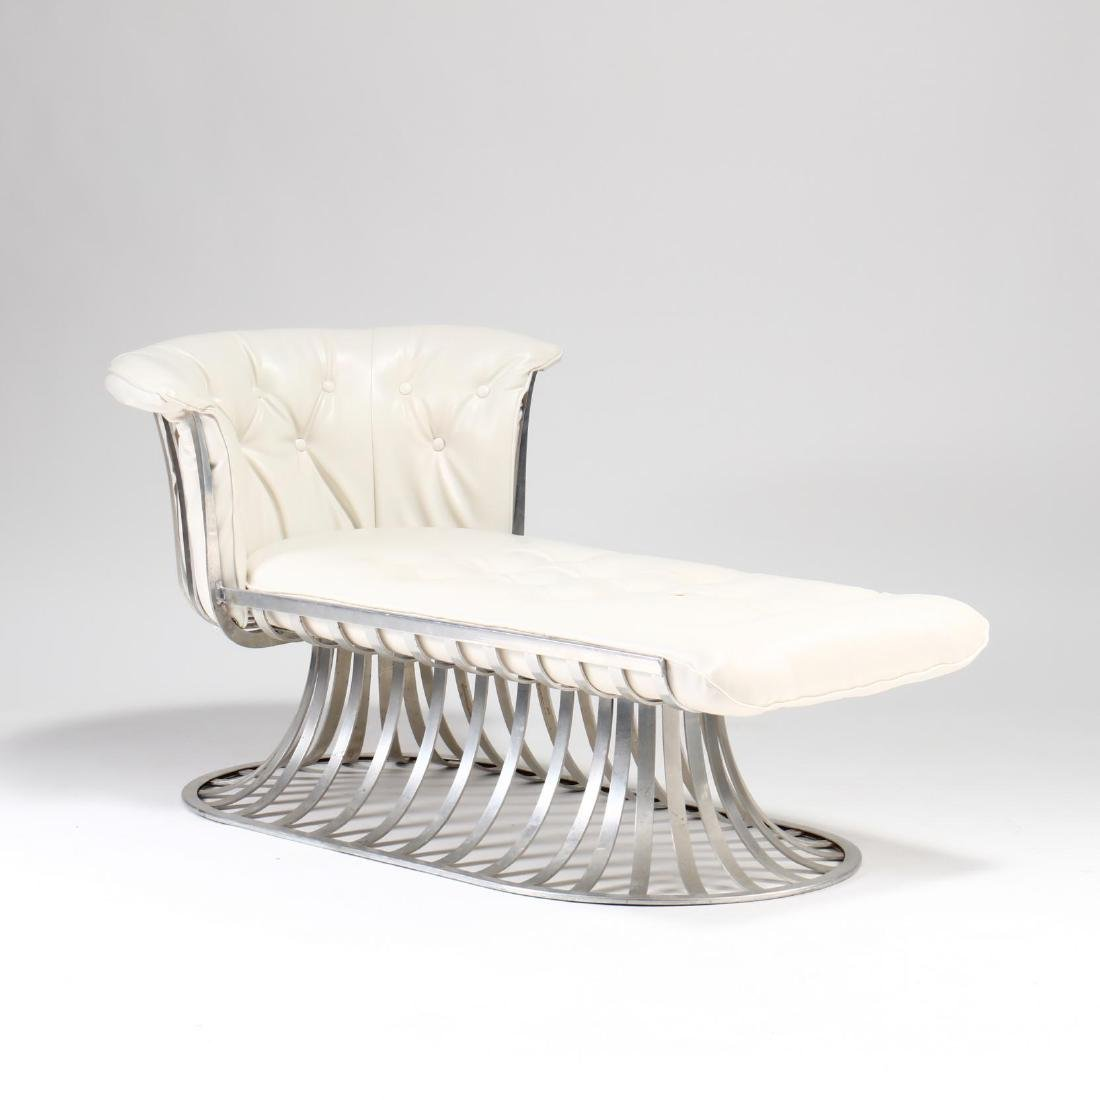 Russell Woodard, Aluminum Chaise Lounge